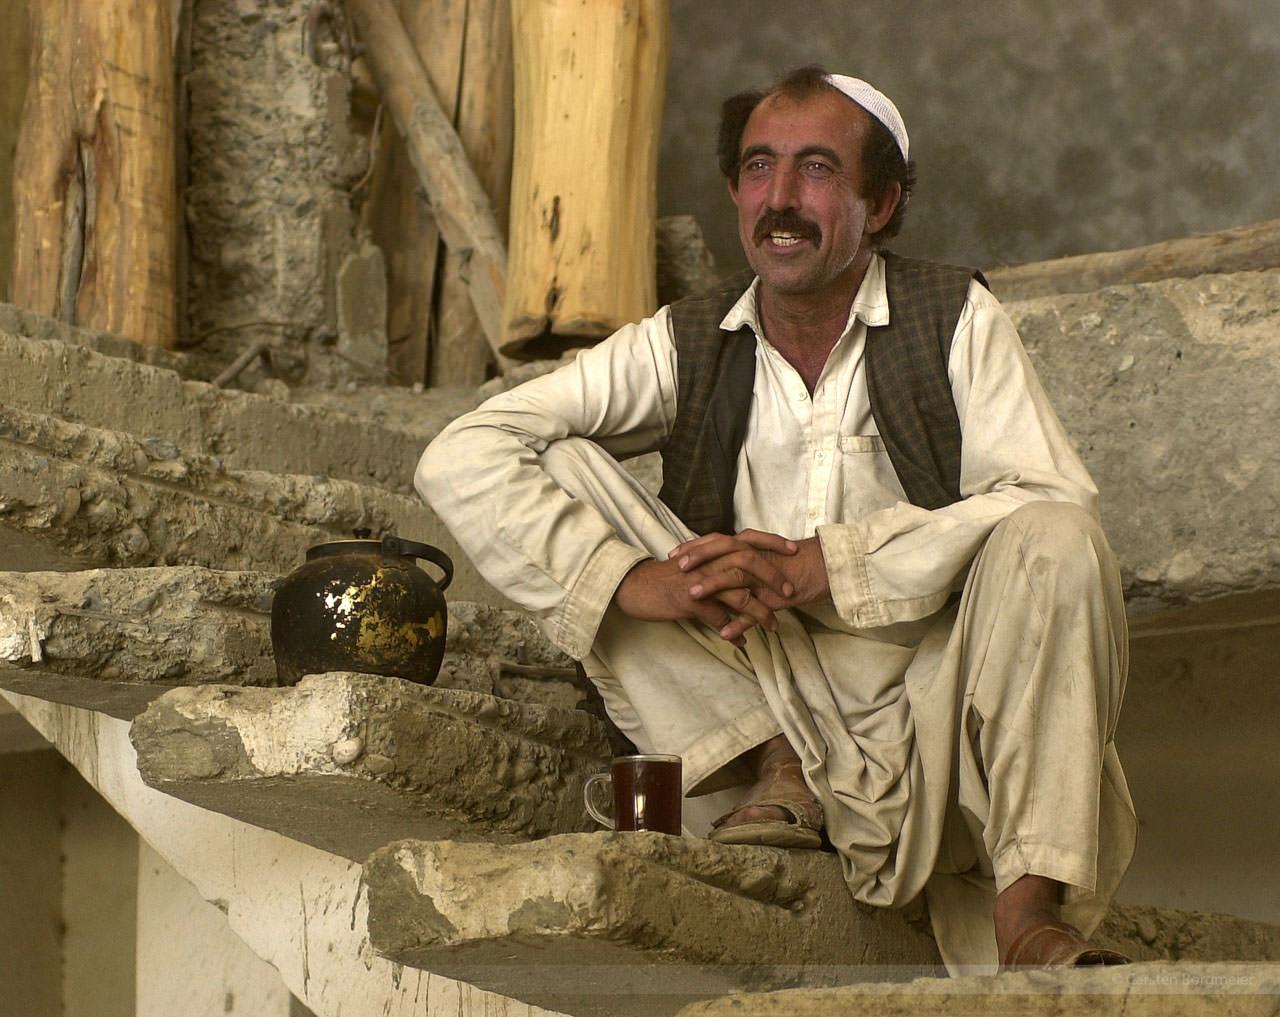 Teetime beim Hausbau, Udkhal, Afghanistan, Juli 2004